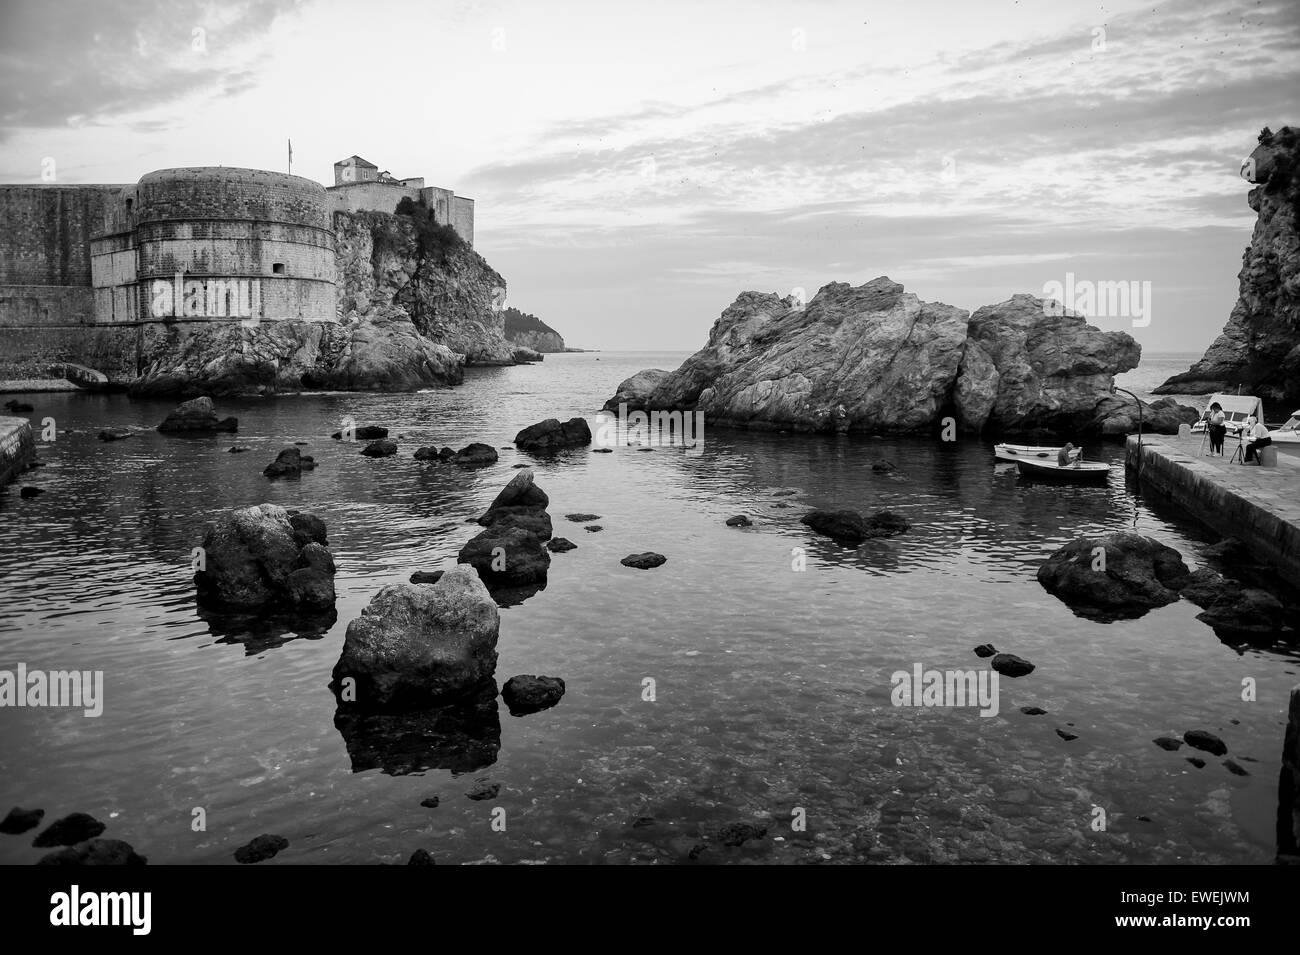 Dramatic Mediterranean coastline on the Adriatic shore of Dubrovnik Croatia - Stock Image